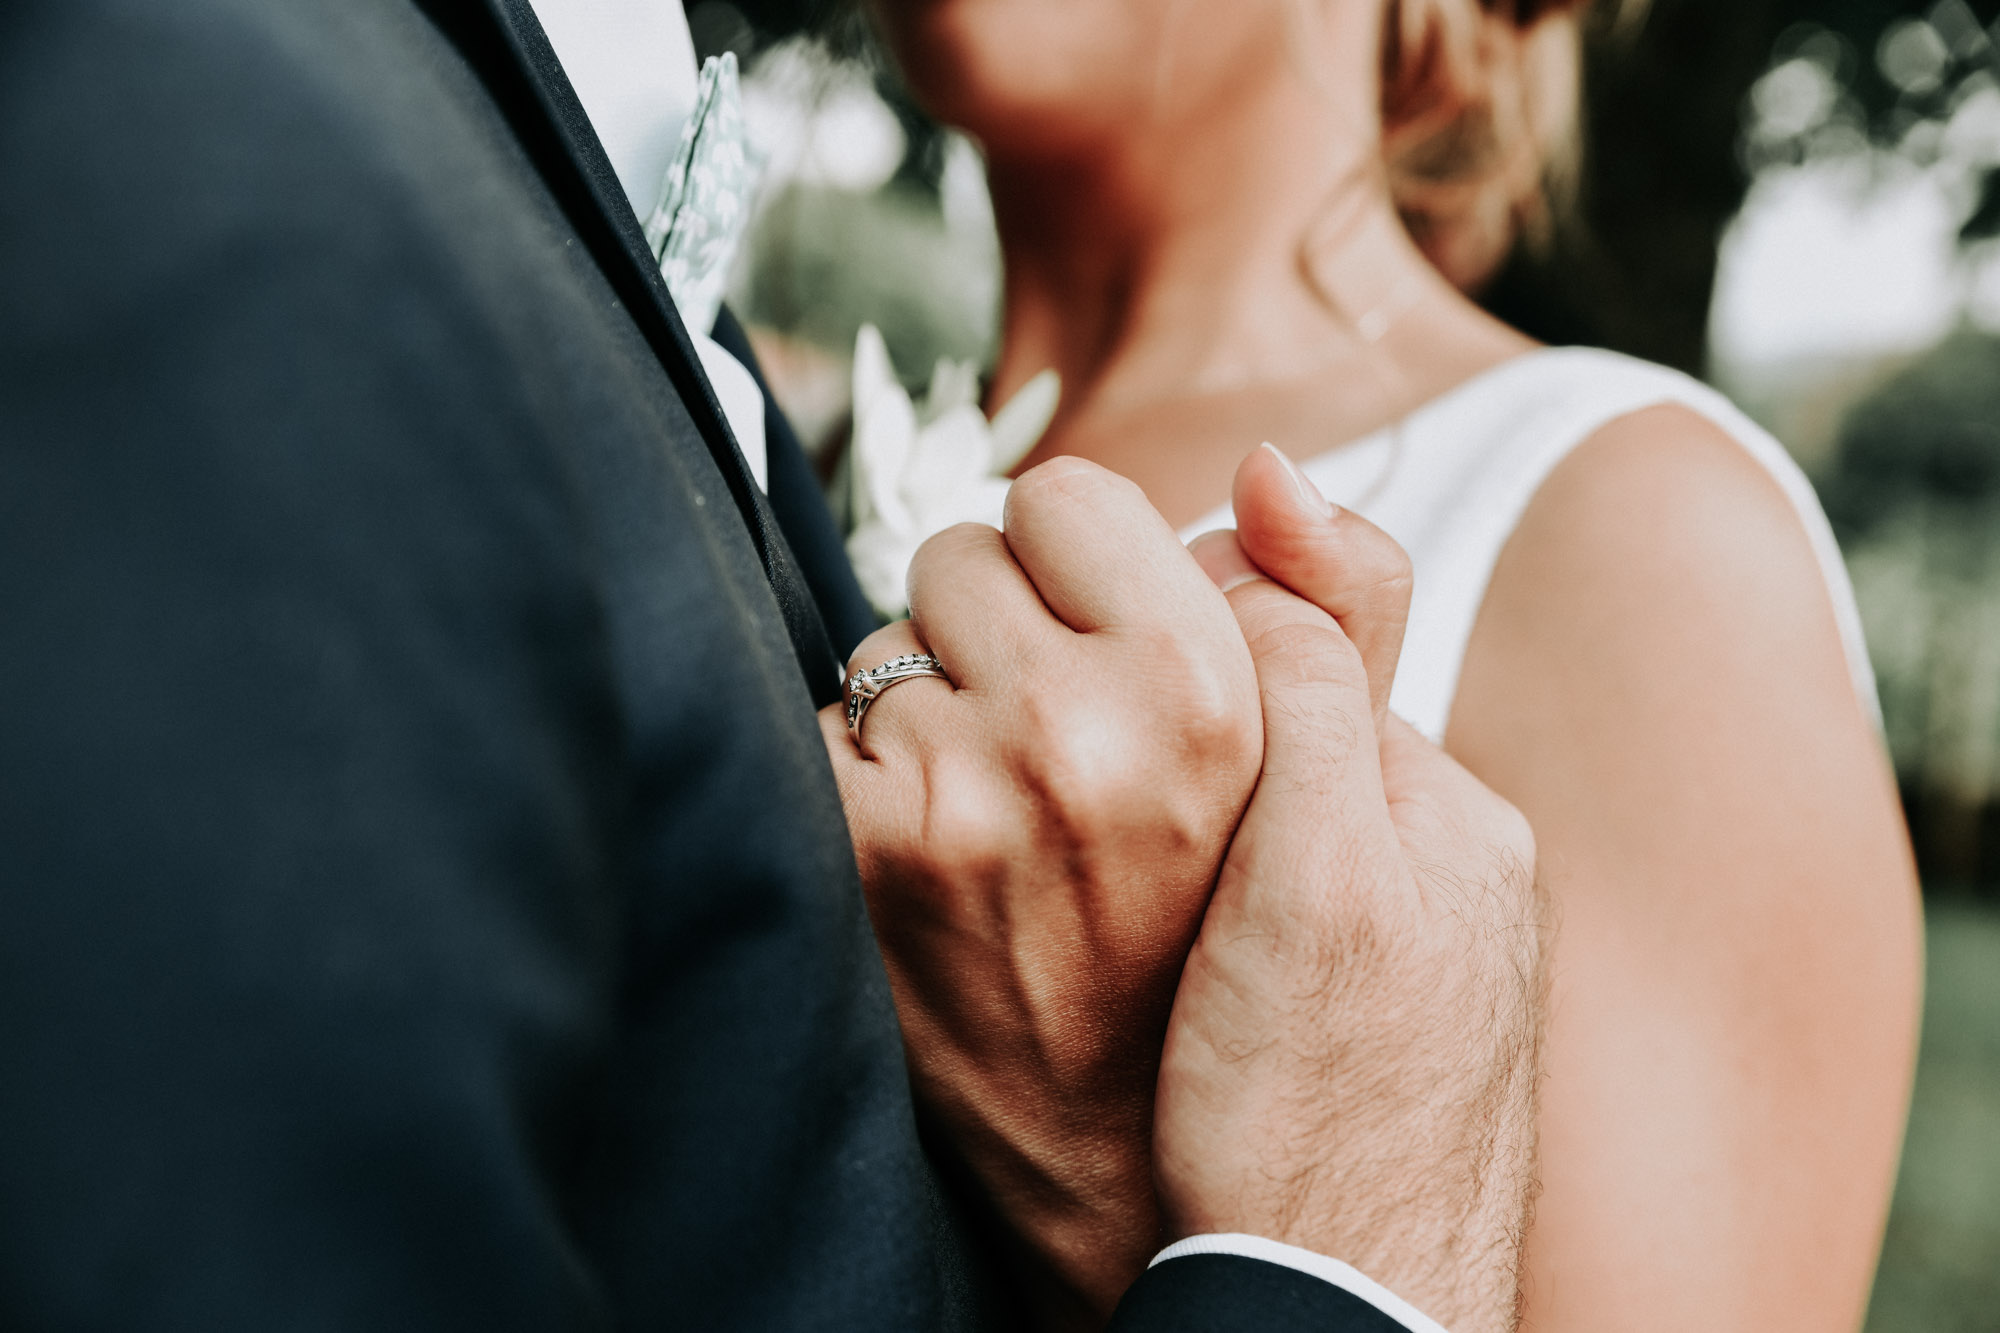 2018-07-21 - LD8_0236 - photographe mariage lyon - laurie diaz - www.lauriediazweeding.com.jpg